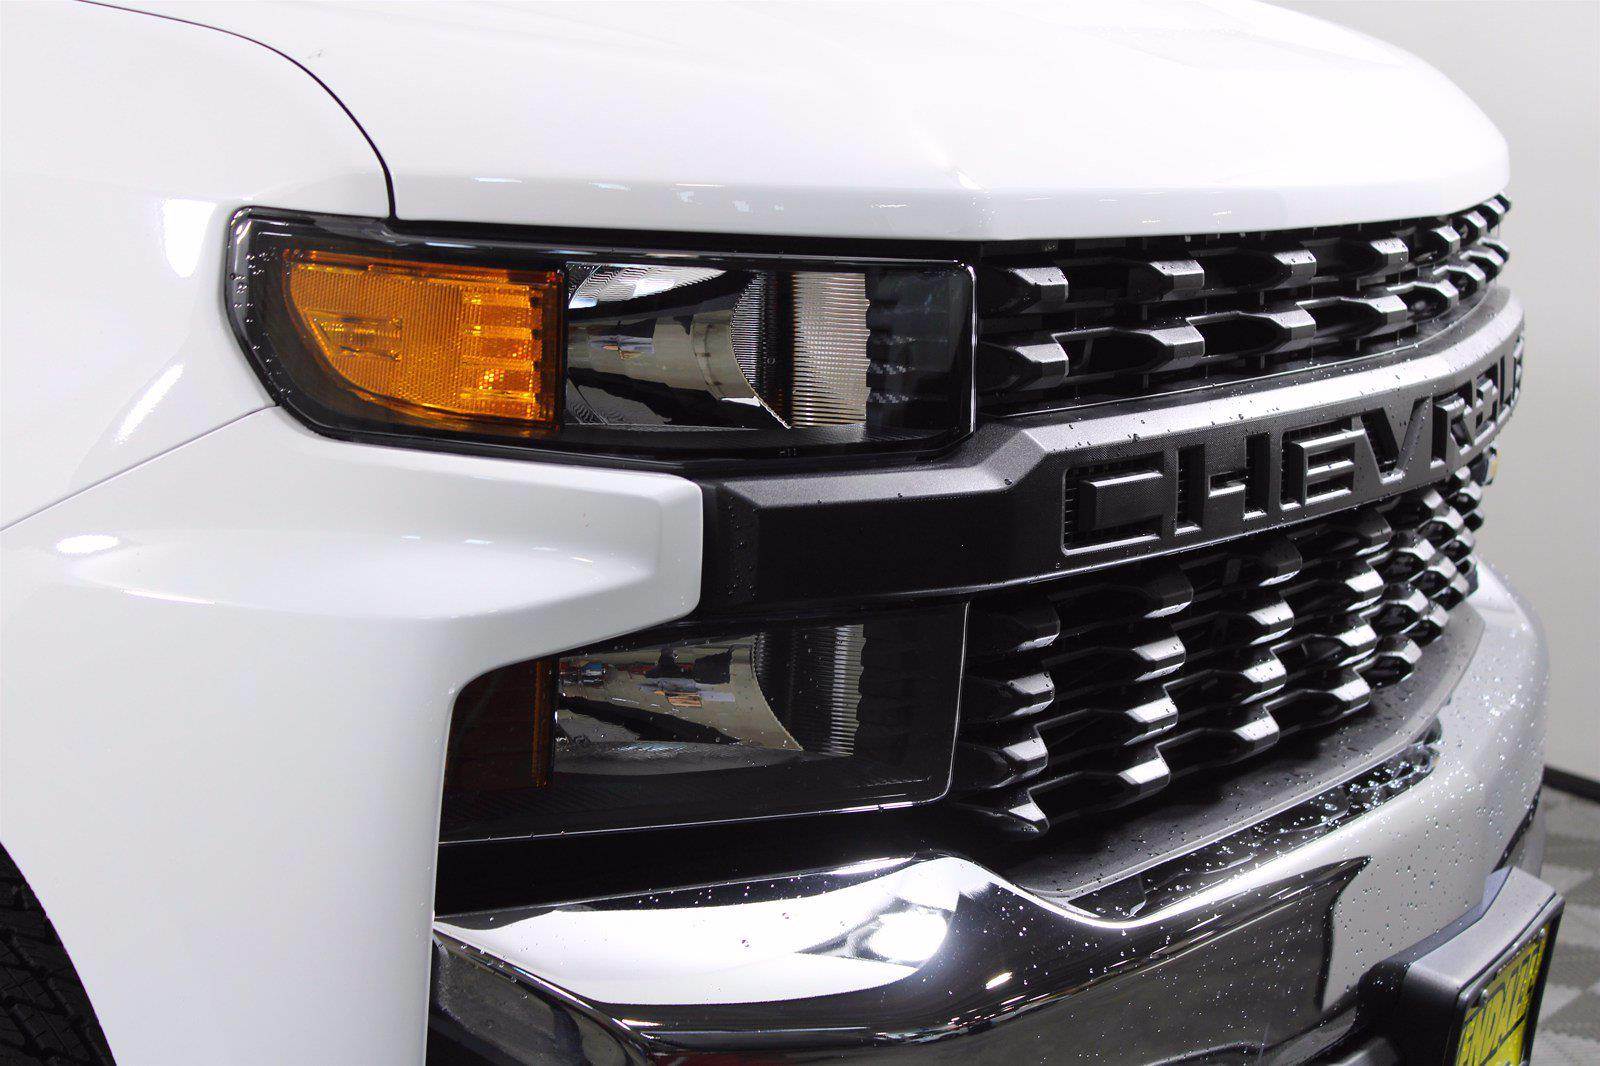 2021 Chevrolet Silverado 1500 Regular Cab 4x2, Pickup #D110764 - photo 5